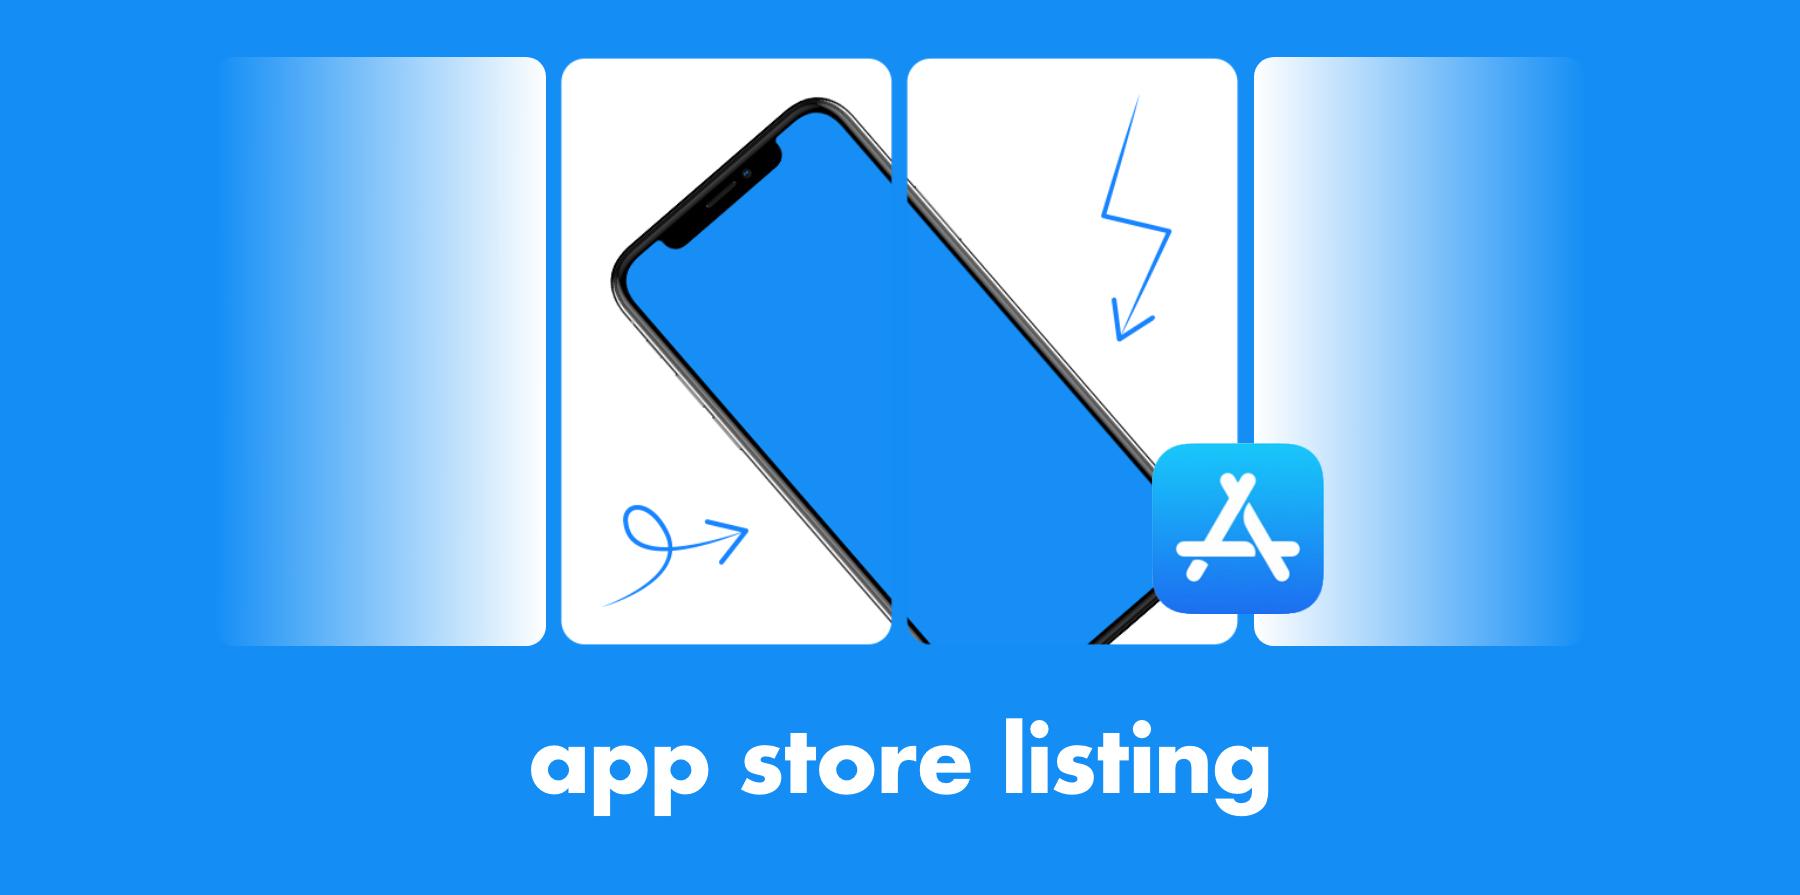 app store listing header image